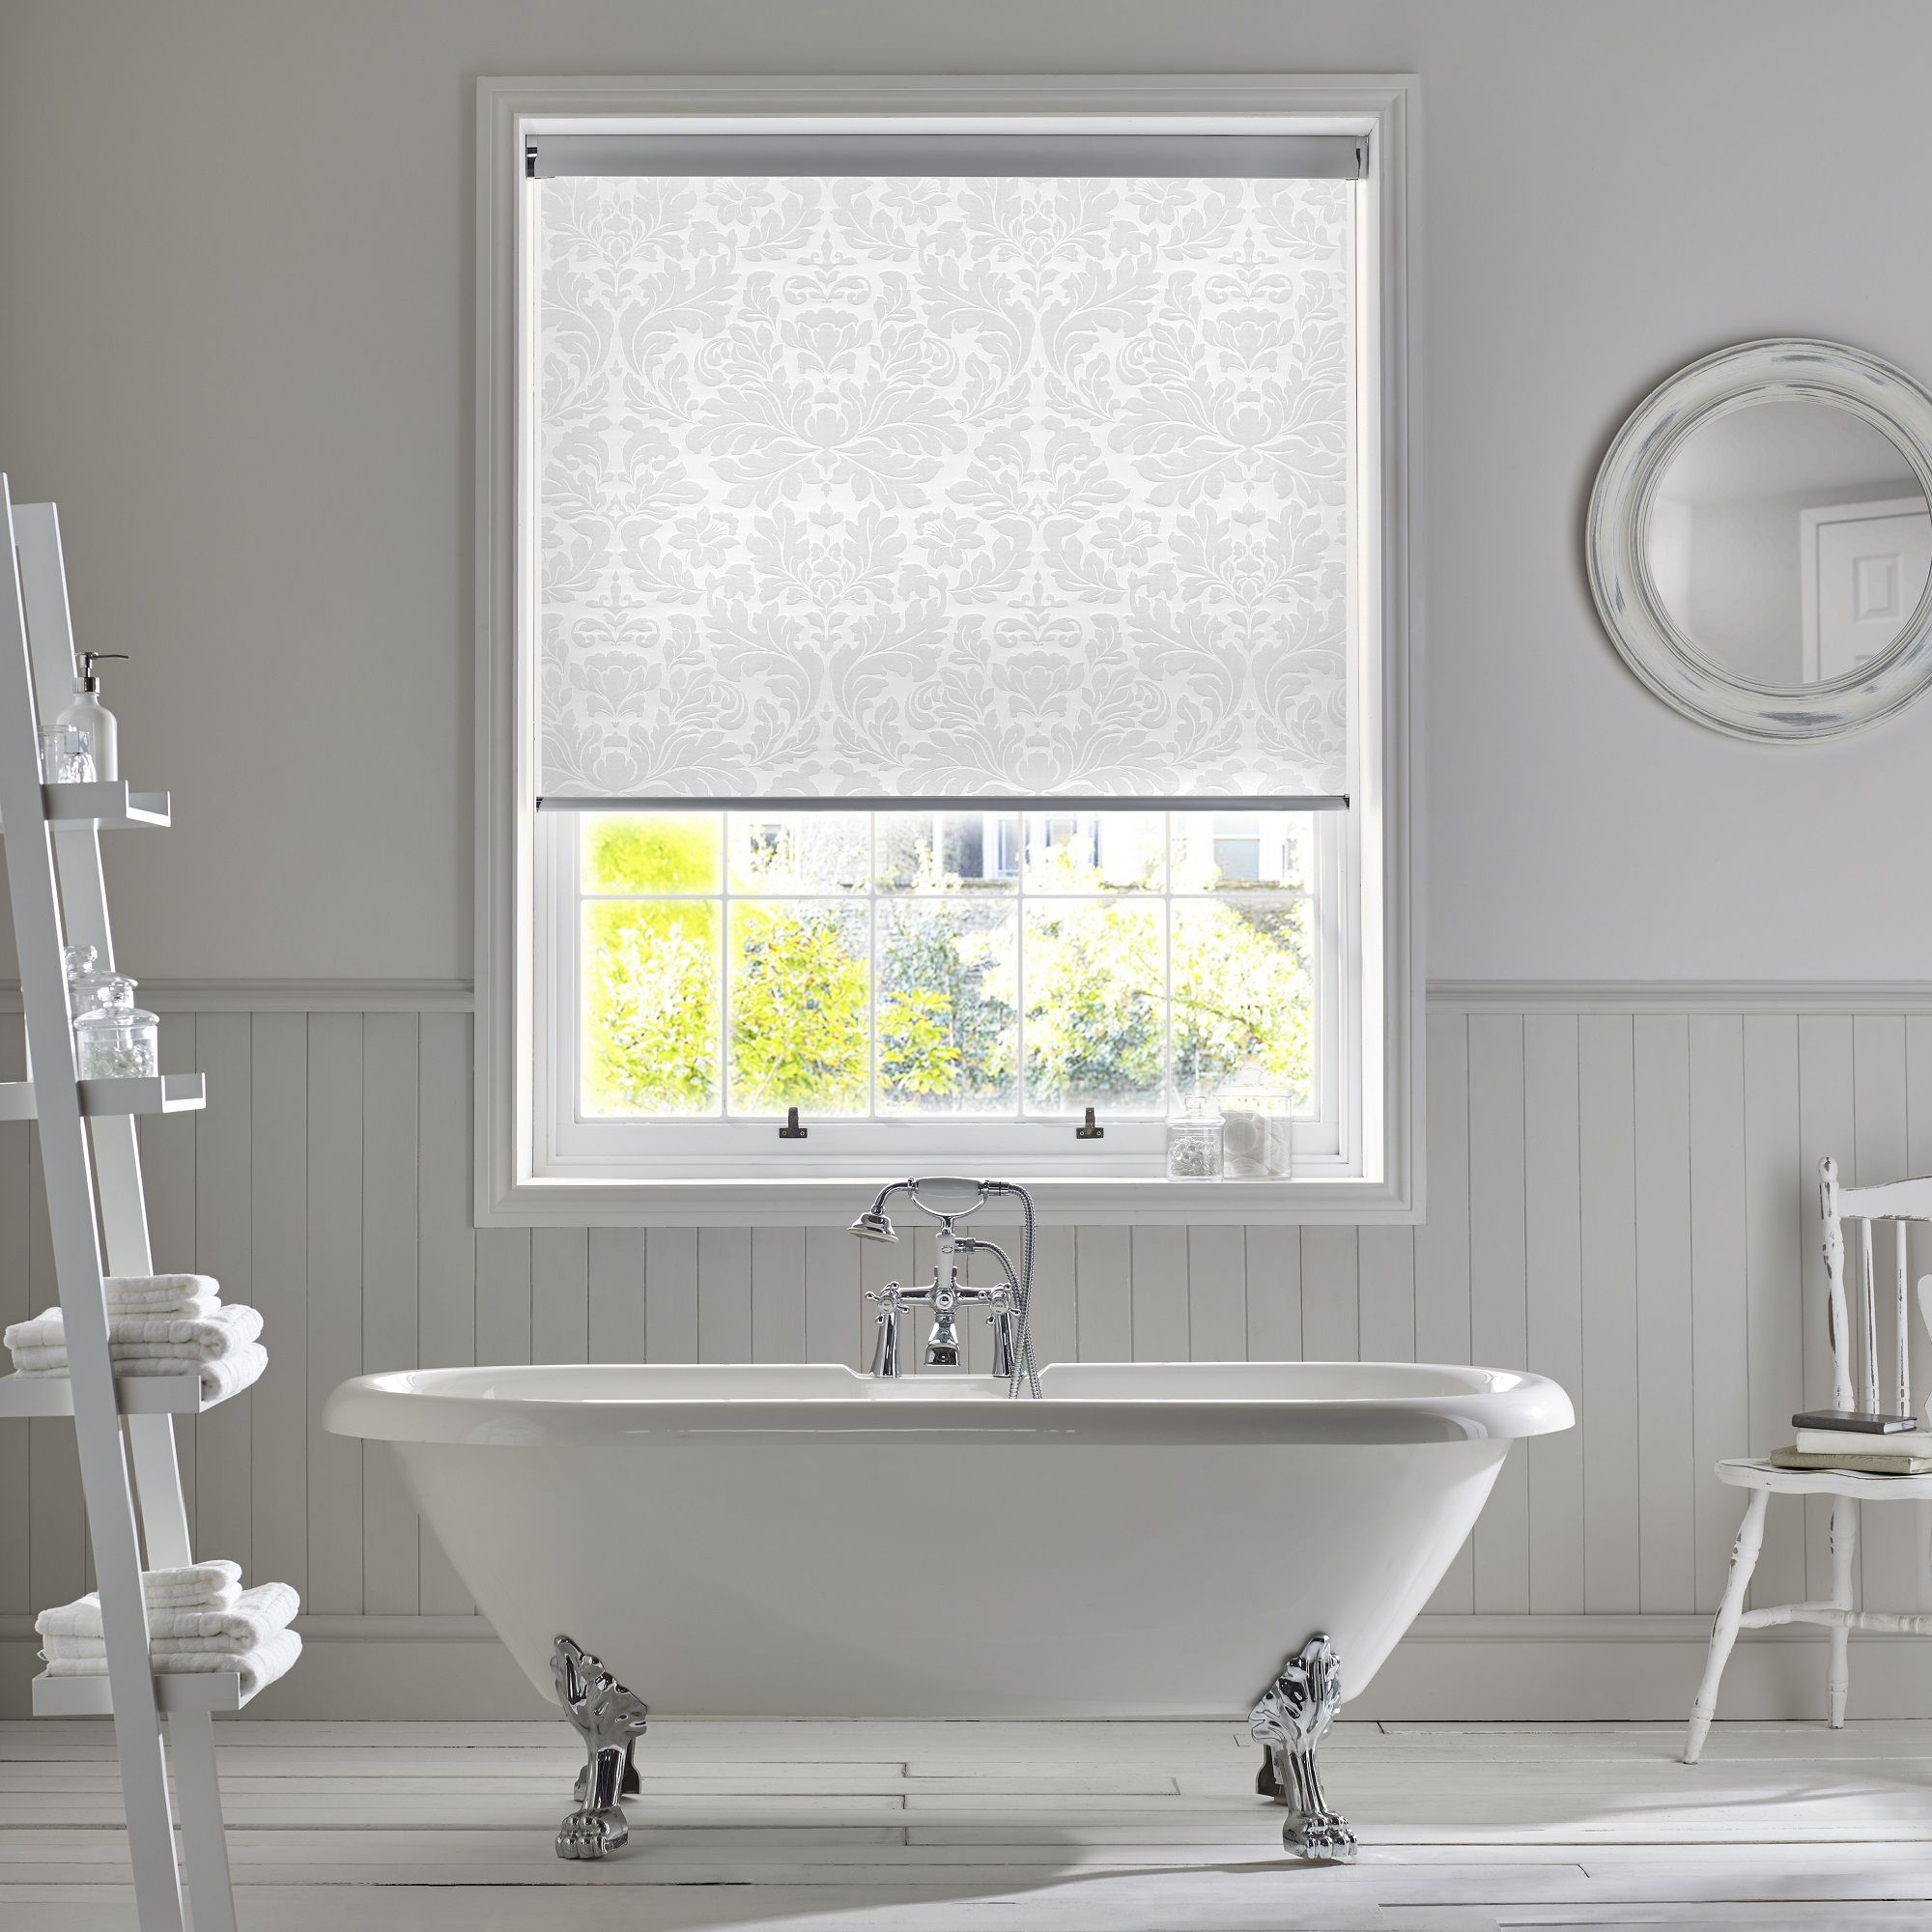 Home Bathroom Blinds White Bathroom Decor Modern Window Dressing [ 2000 x 2000 Pixel ]